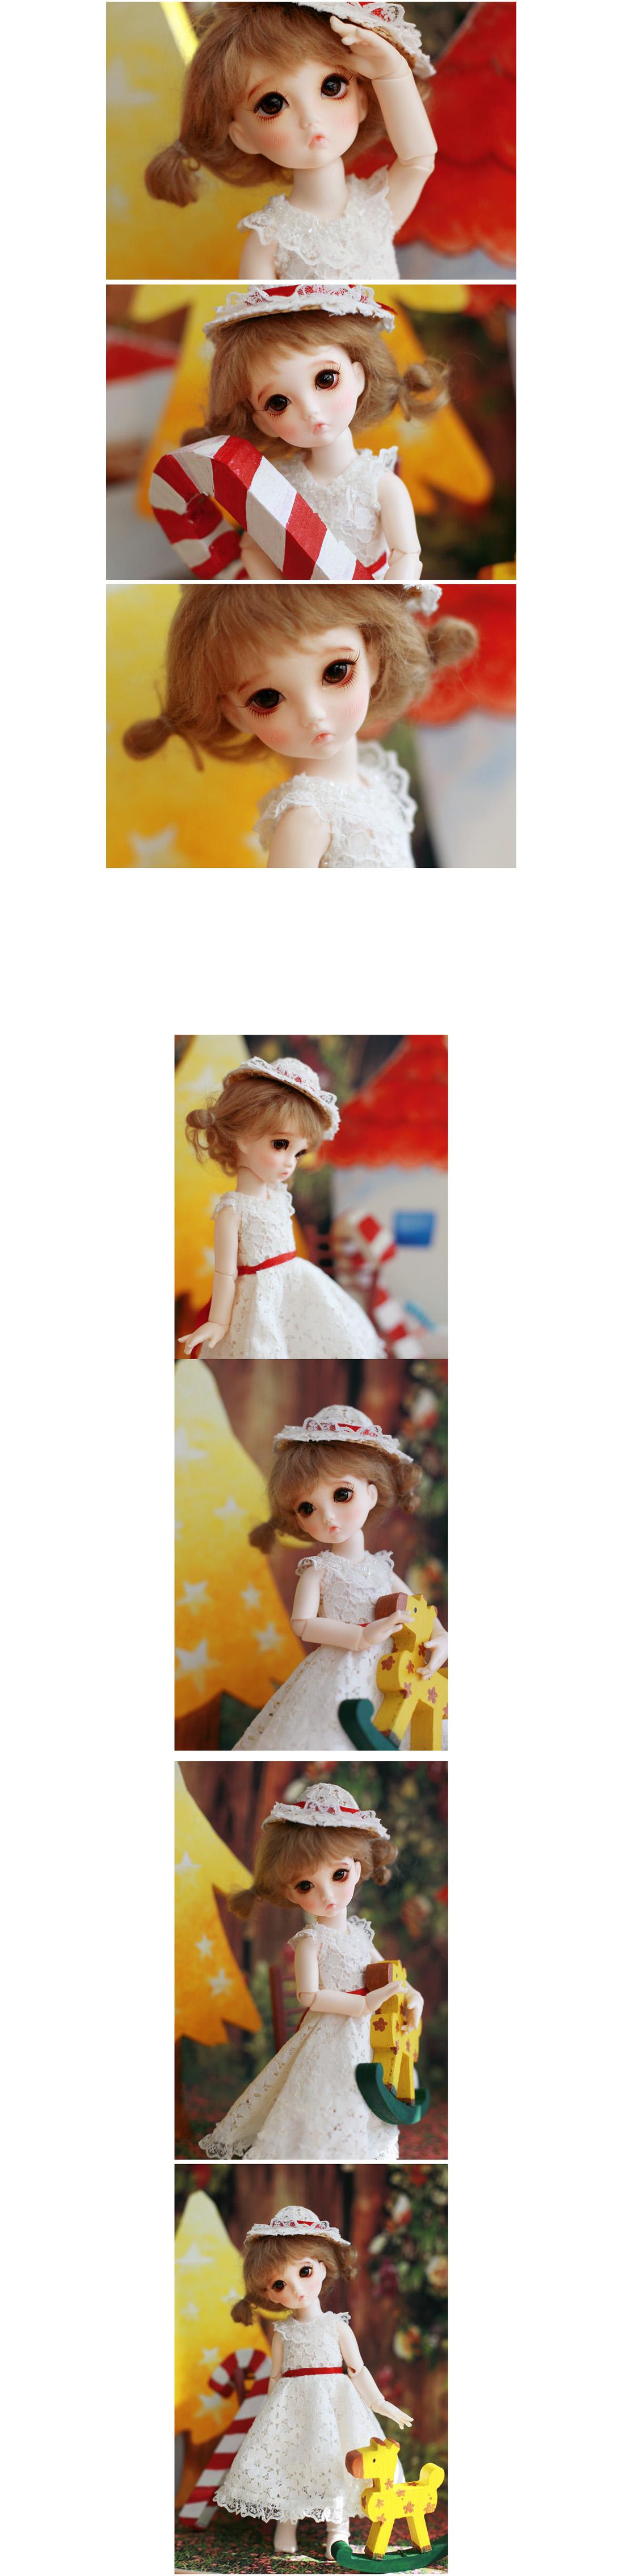 [Dollbom] Como - 26cm ball joint doll, usd